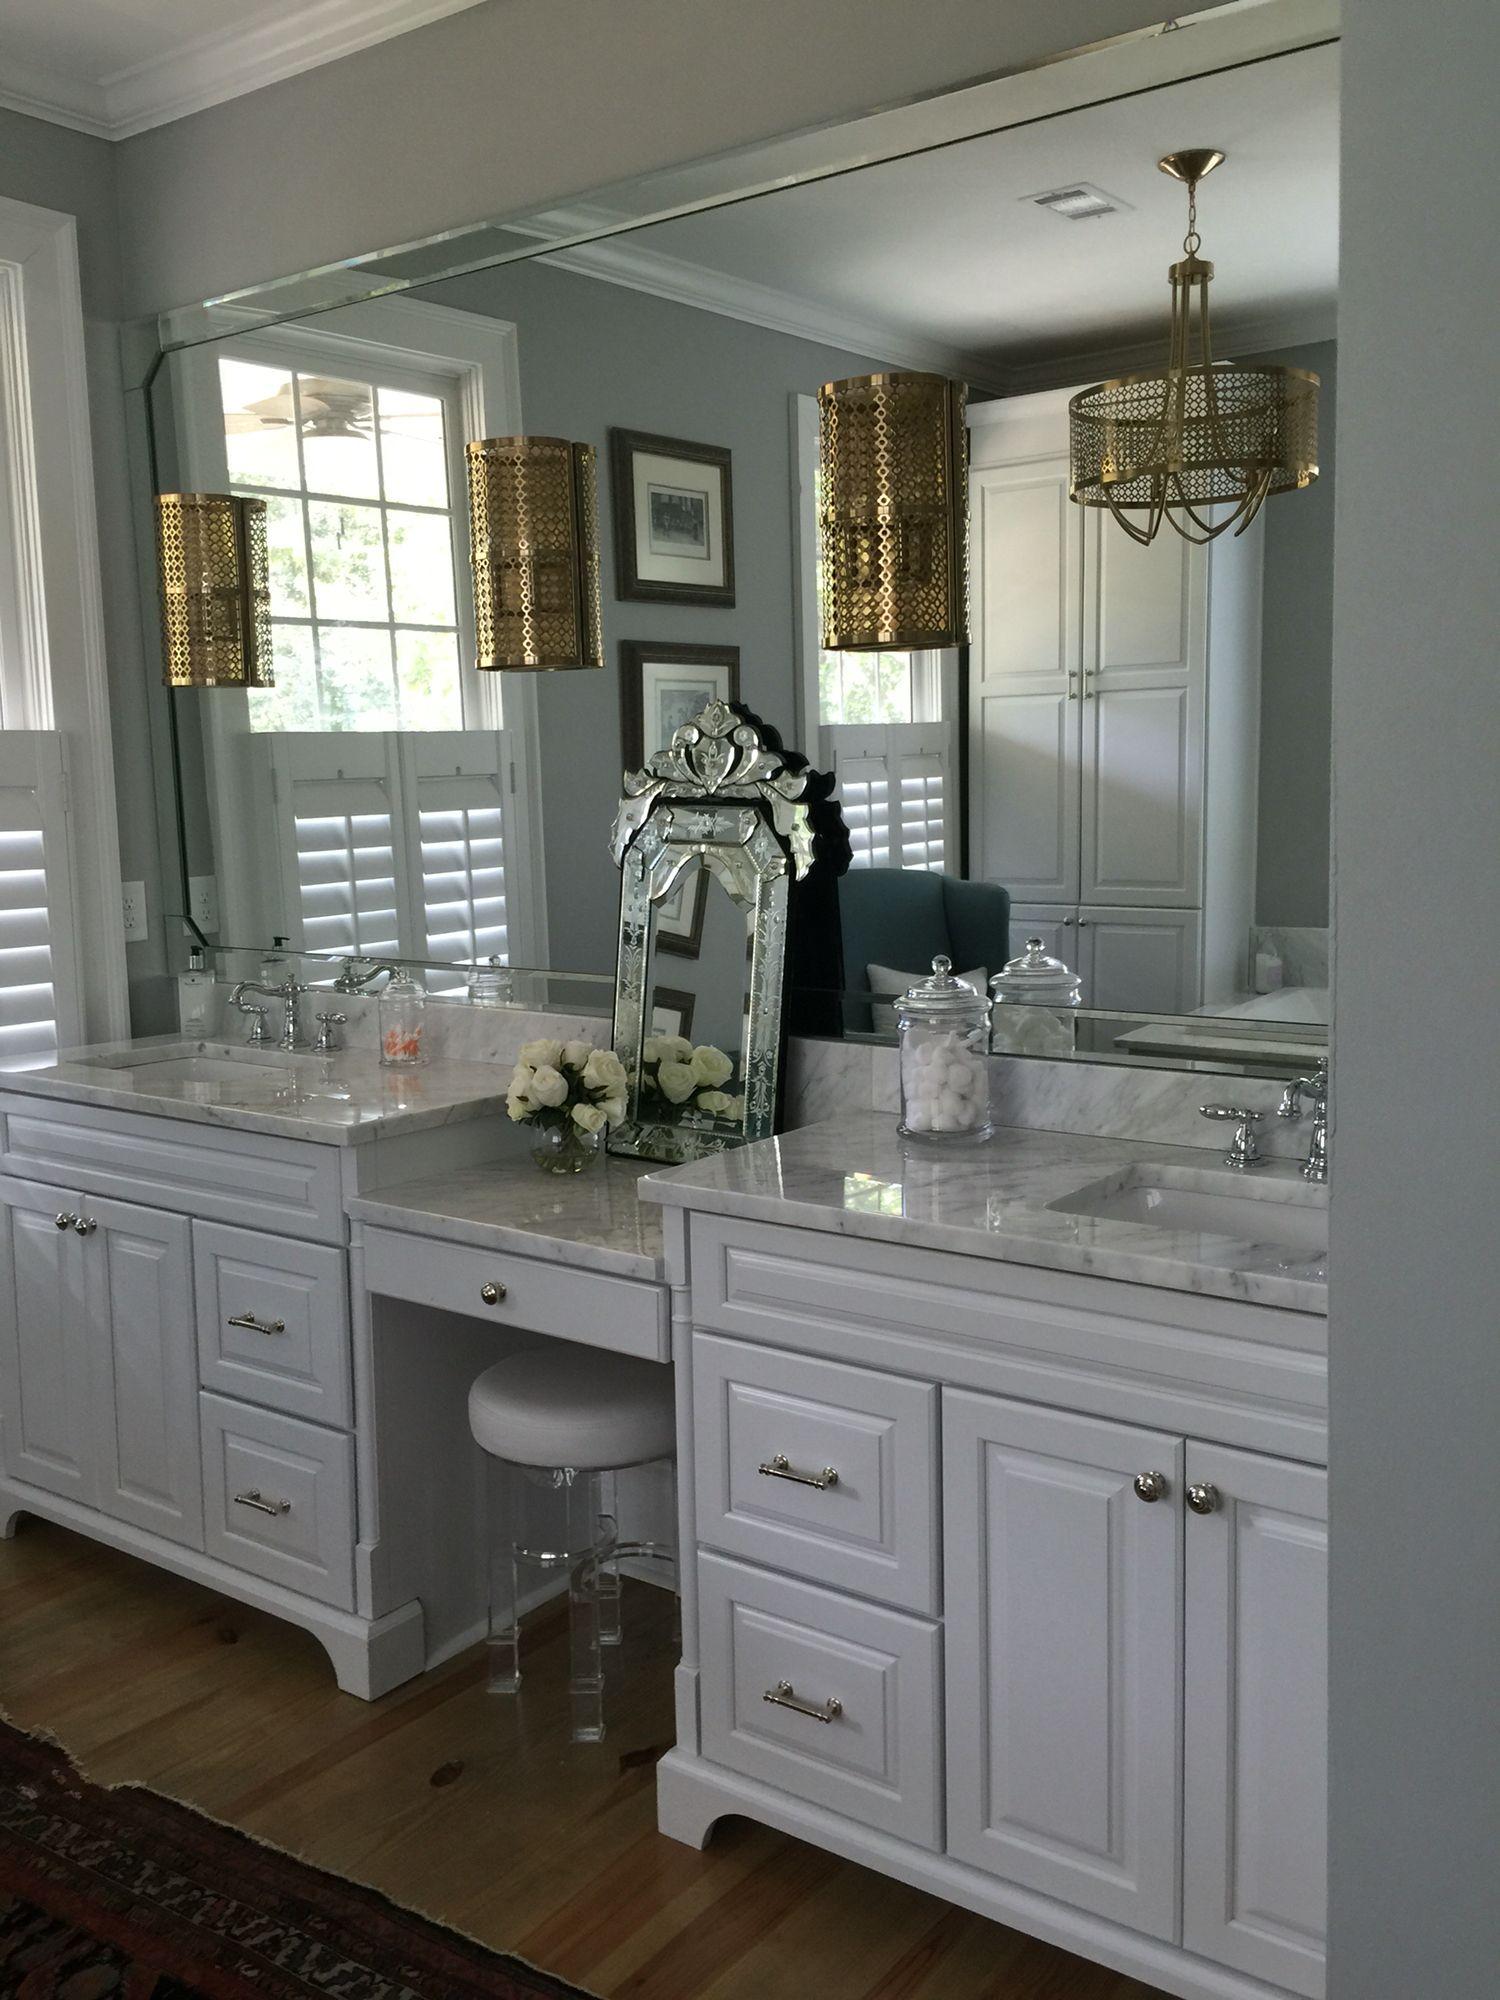 White Cabinets Carrara Marble Brushed